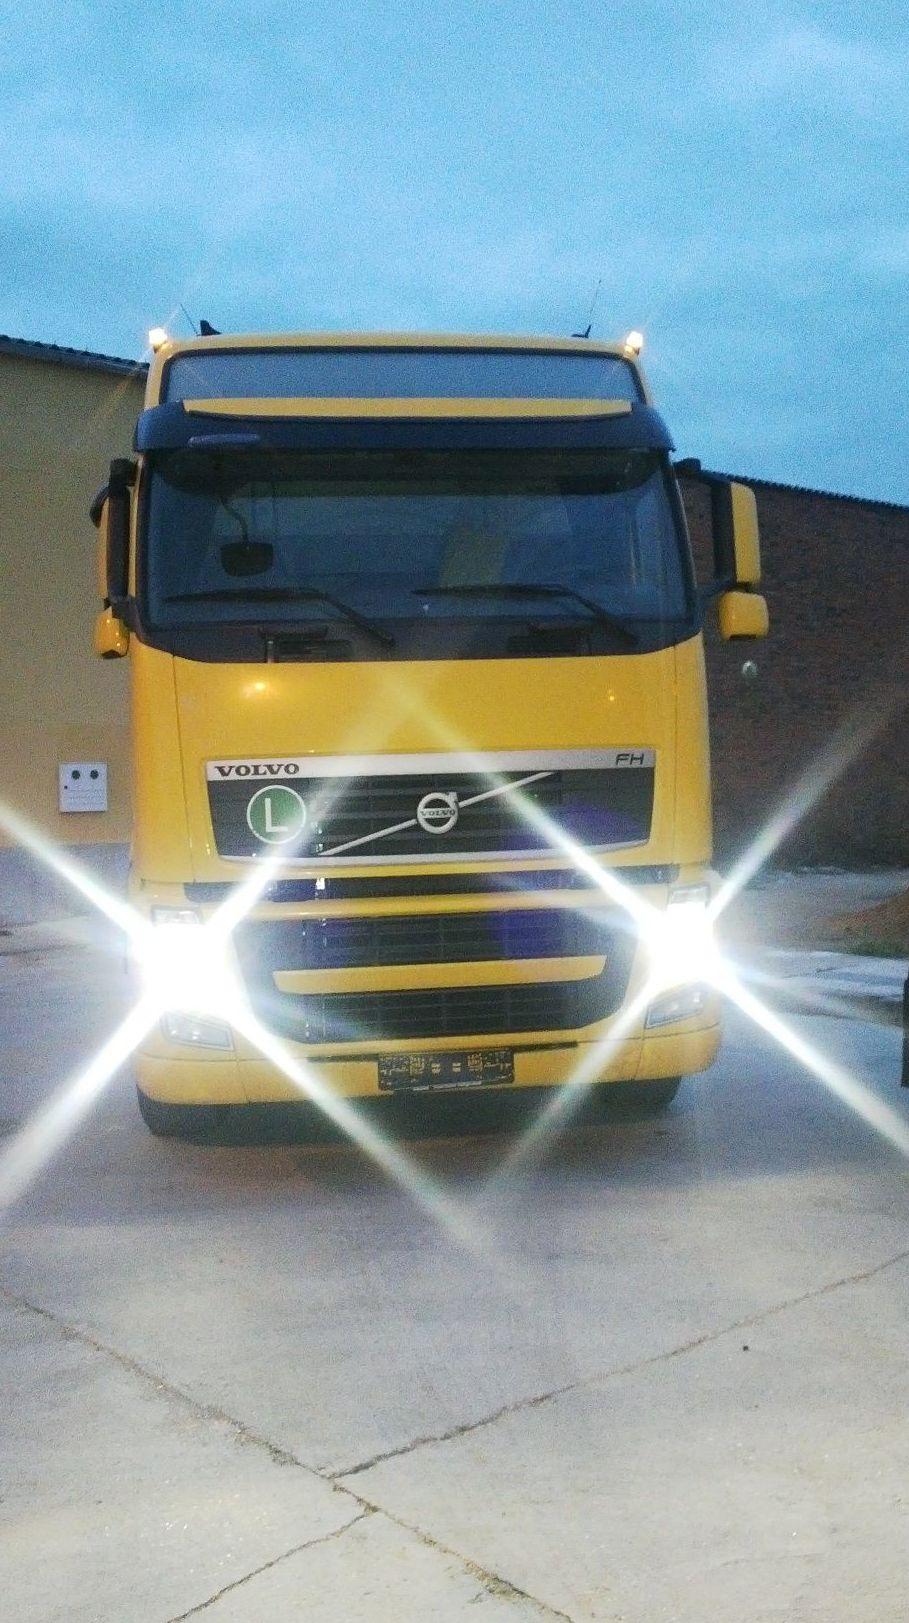 Foto 23 de Camiones en Villares de la Reina | Autotruck Salamanca